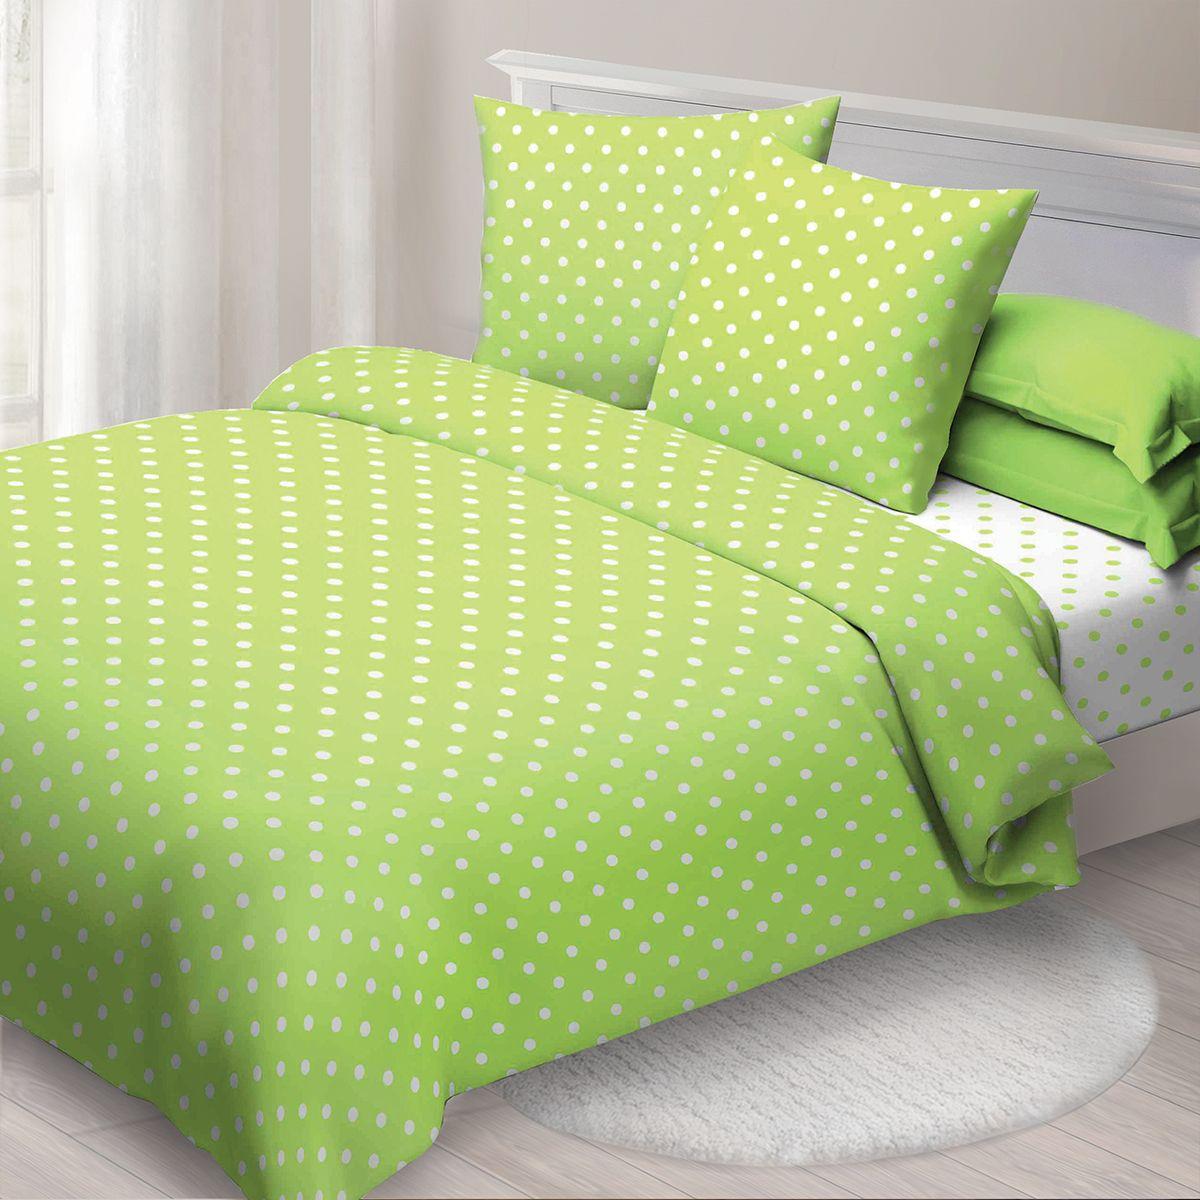 Комплект белья Спал Спалыч Бетти , евро, наволочки 70x70, цвет: зеленый. 4080-182463